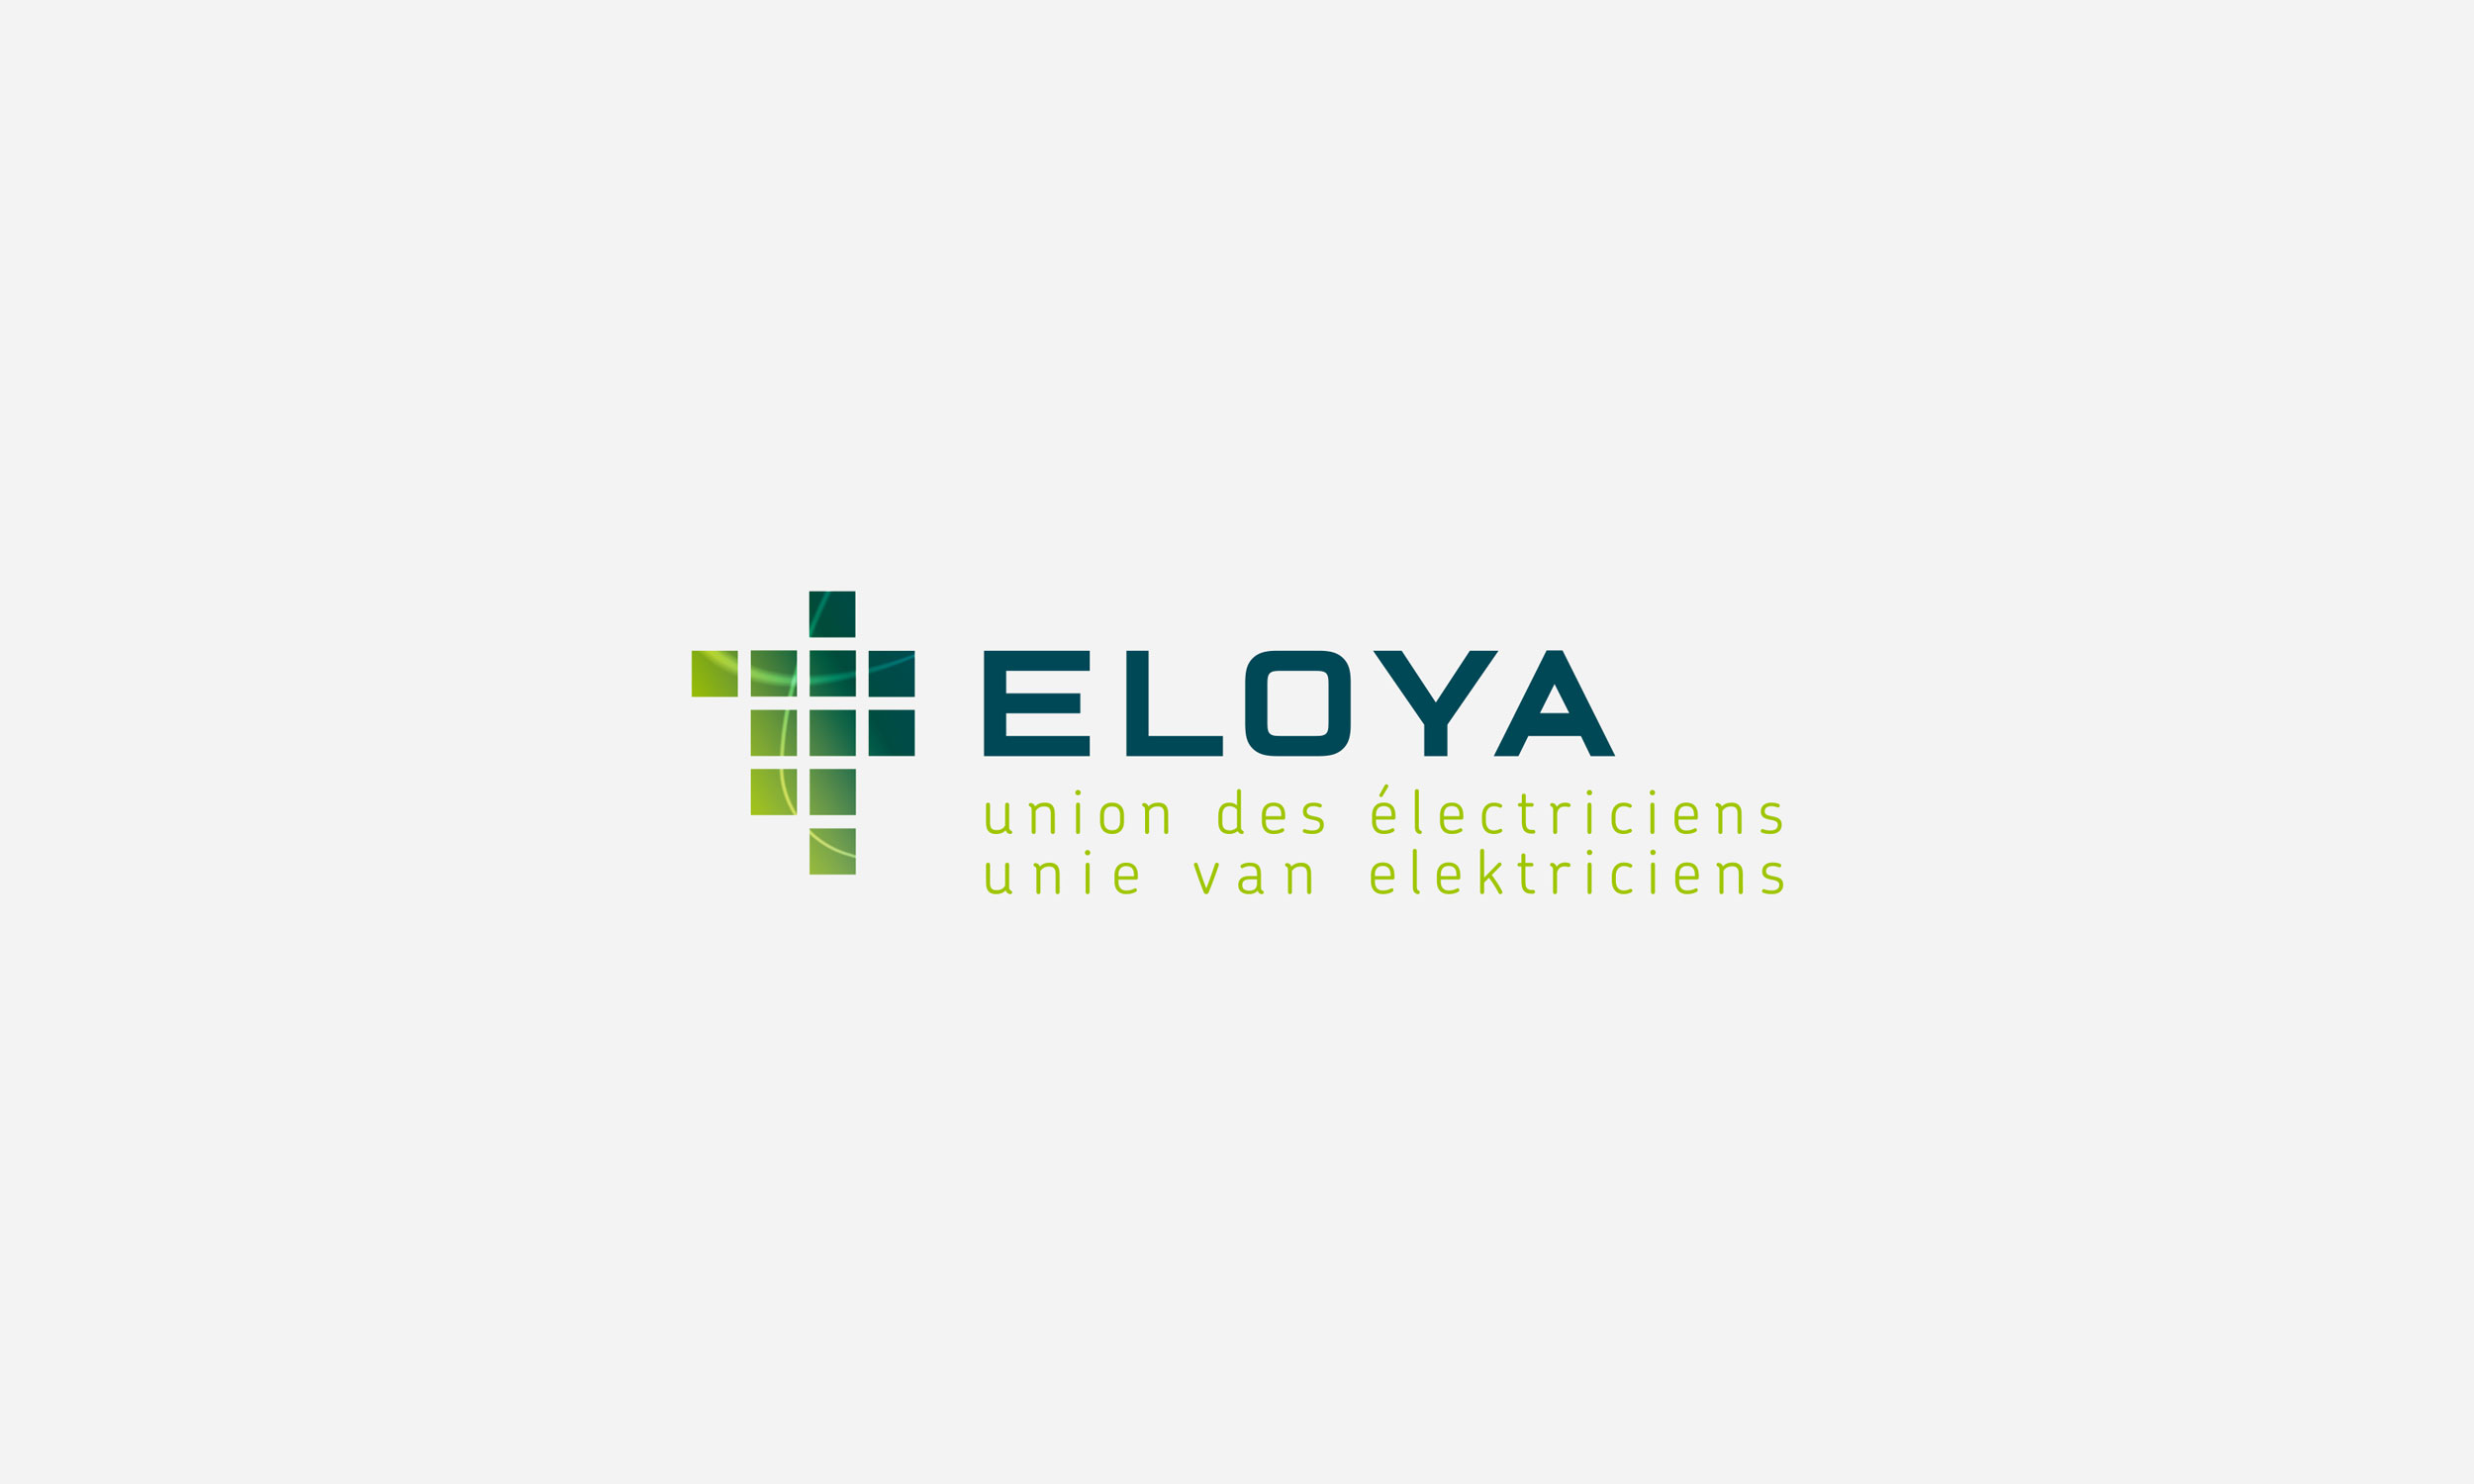 Eloya logo